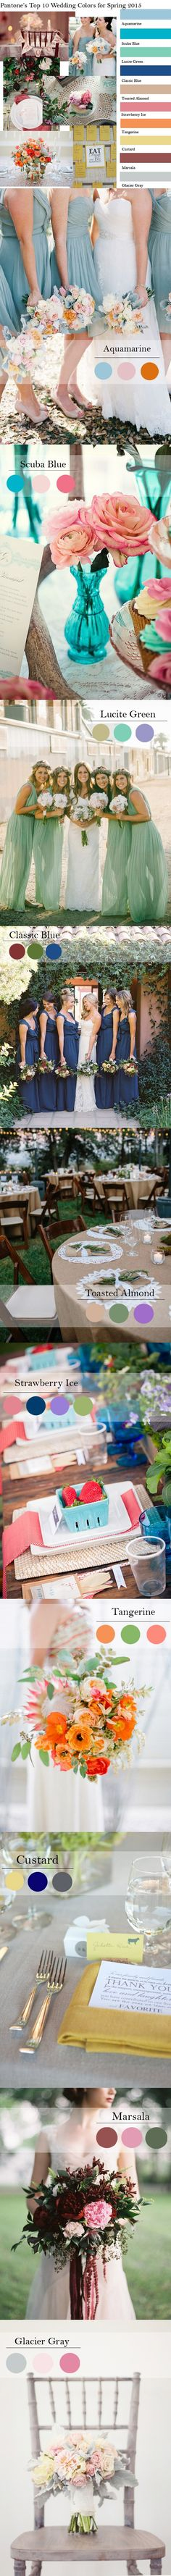 top 10 Pantone fashion wedding color inspiration